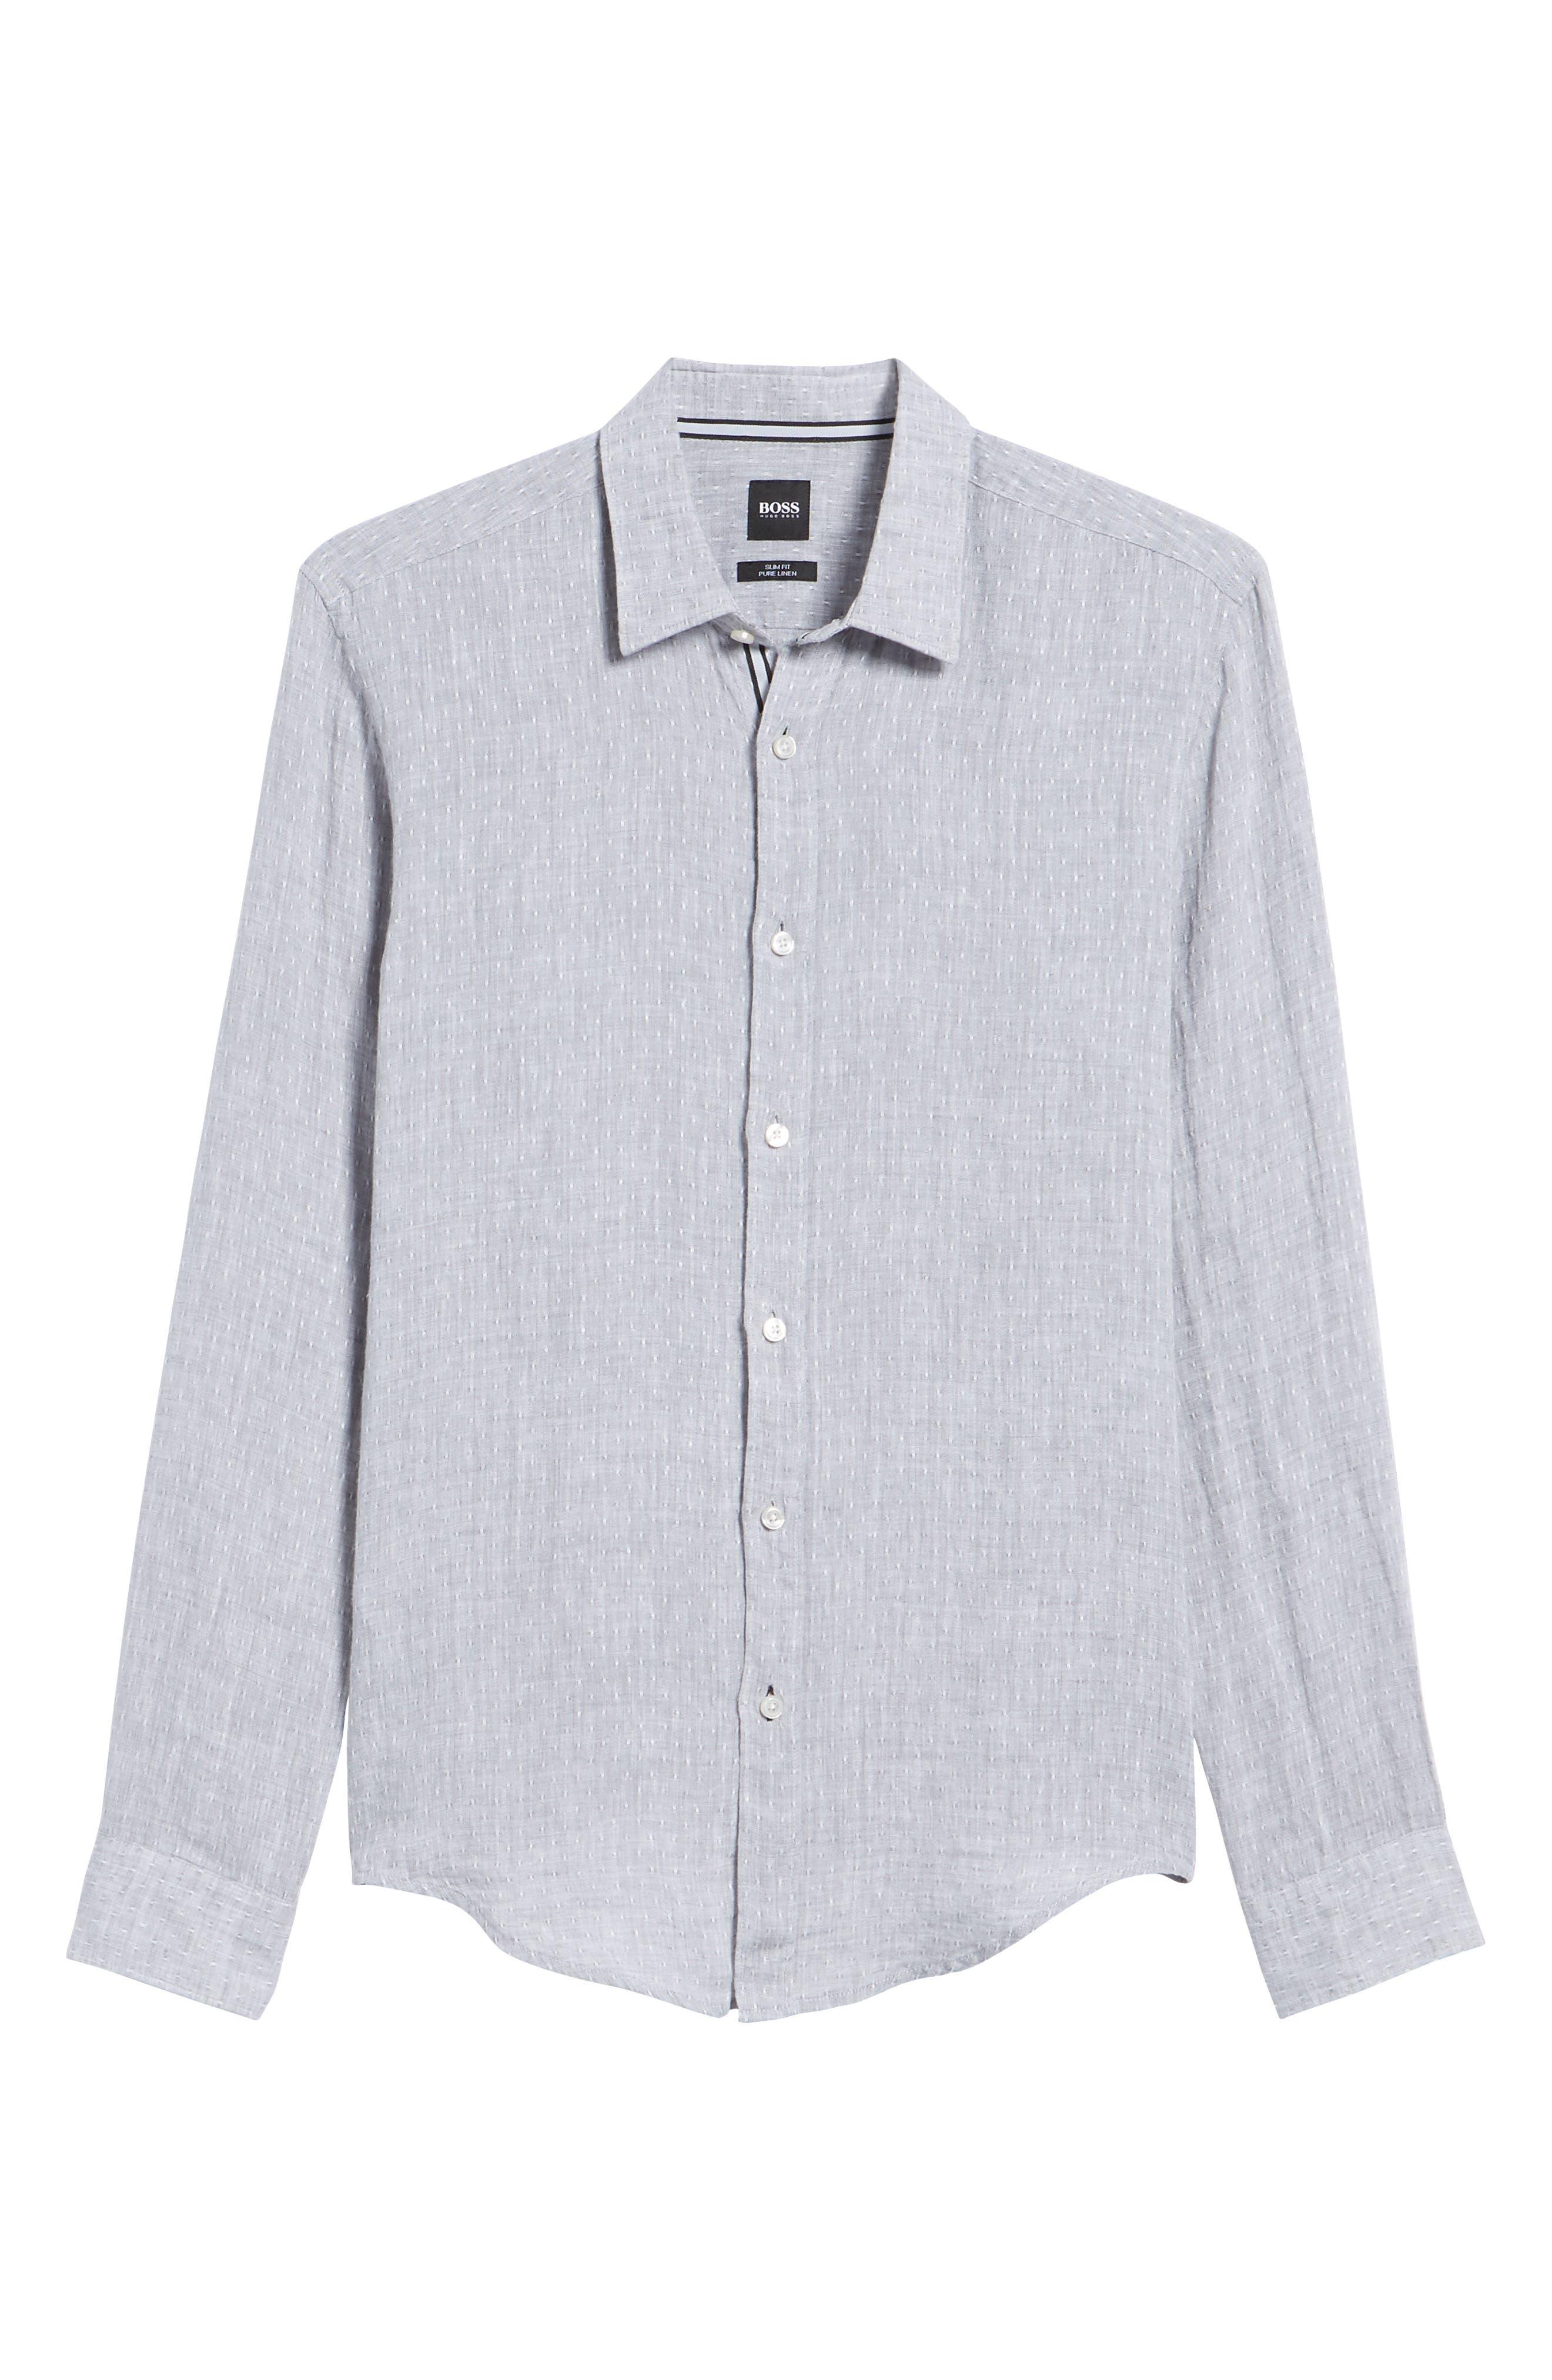 Ronni Slim Fit Dobby Linen Sport Shirt,                             Alternate thumbnail 6, color,                             071